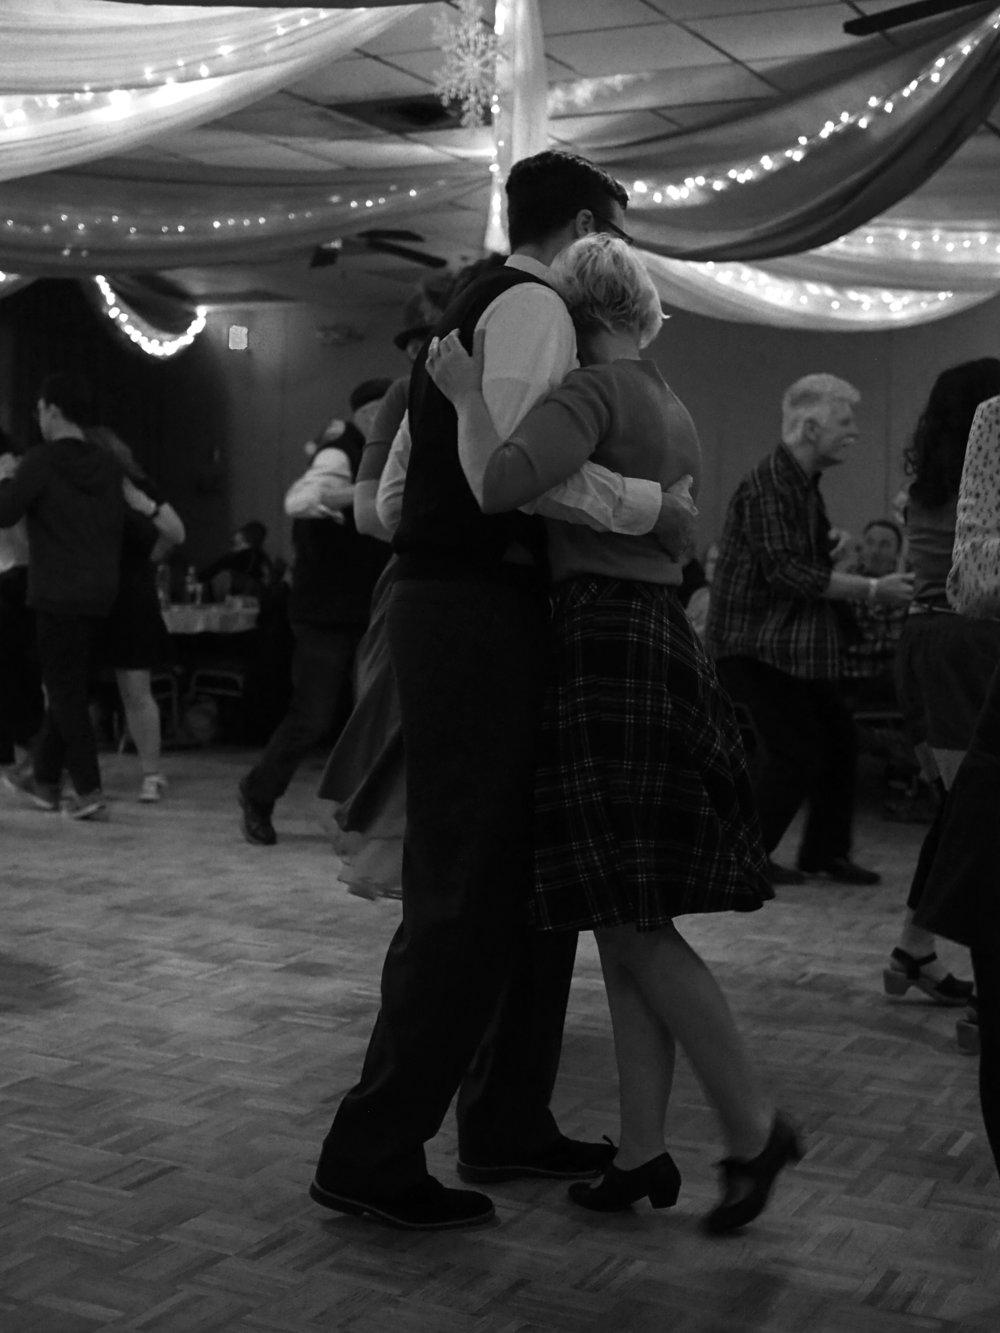 Dancers. December 2017.